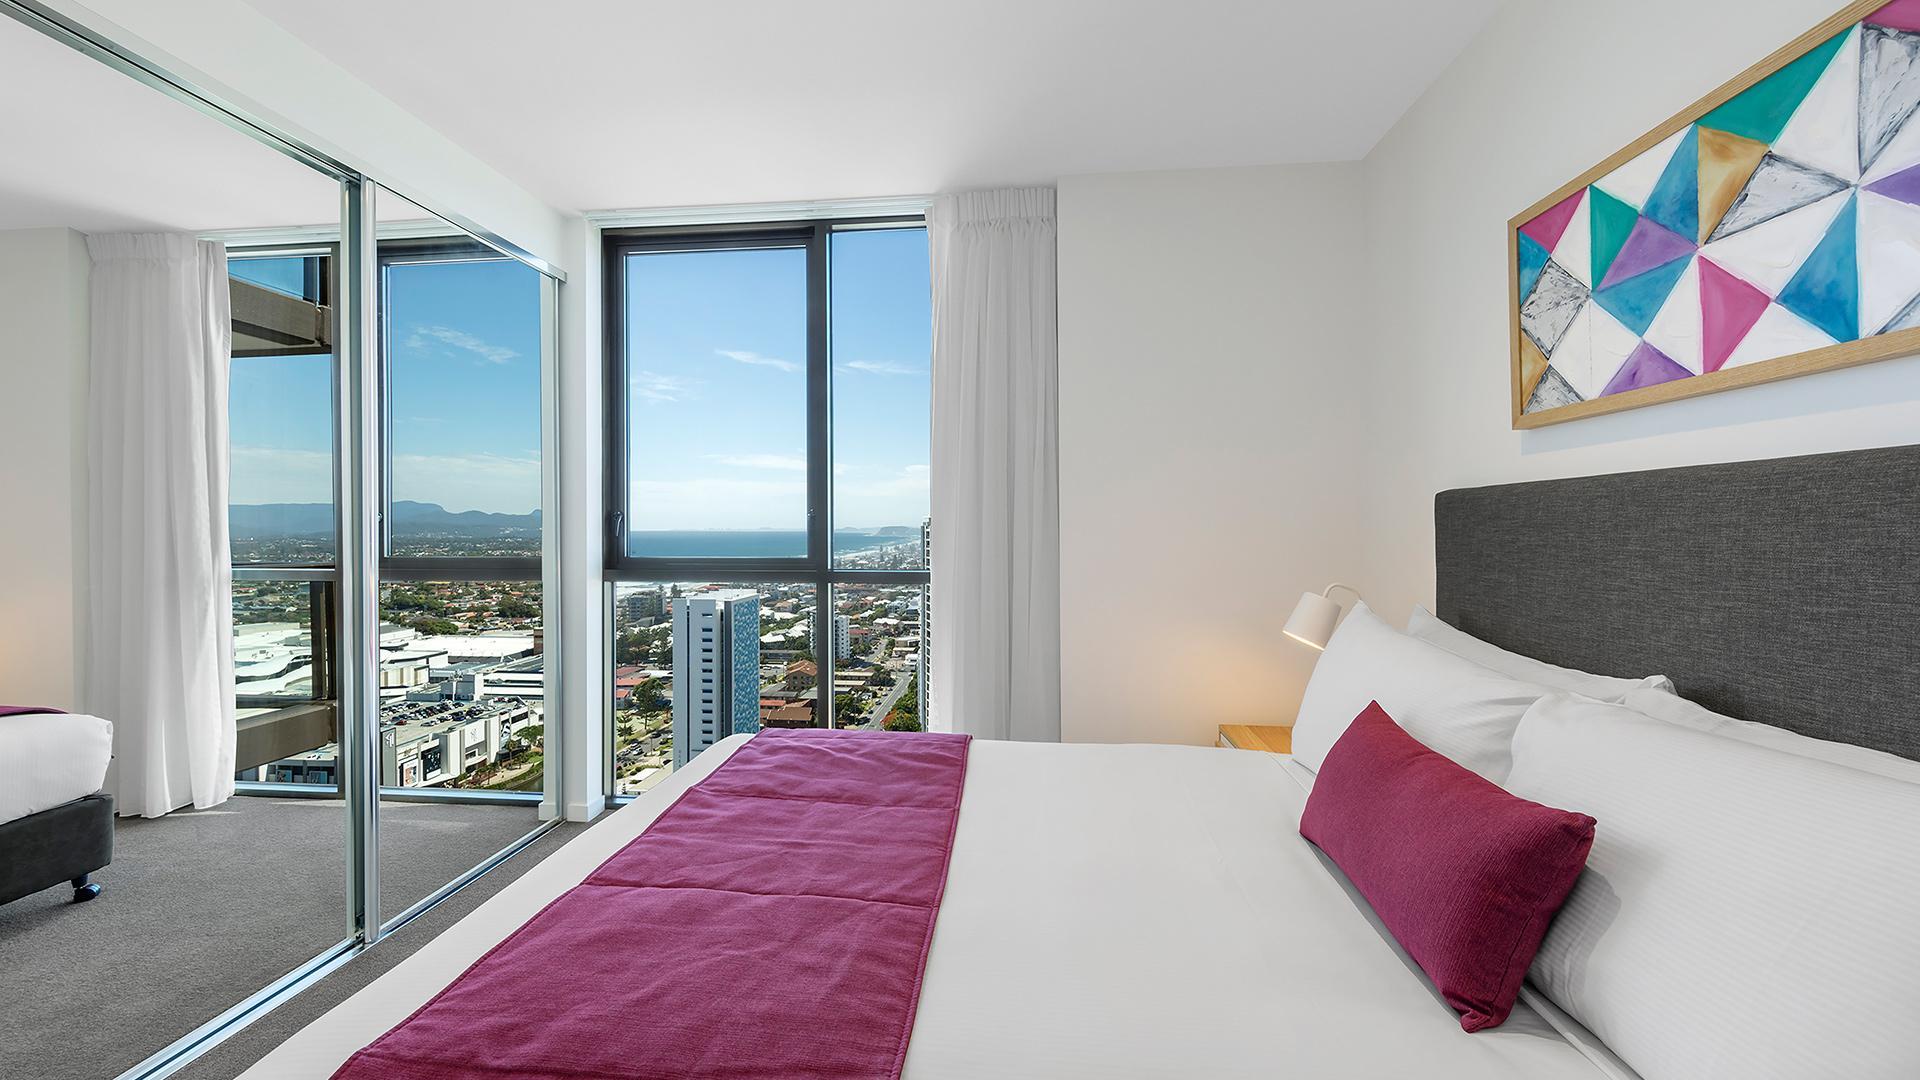 One-Bedroom Ocean-View Suite image 1 at AVANI Broadbeach Gold Coast Residences by City of Gold Coast, Queensland, Australia